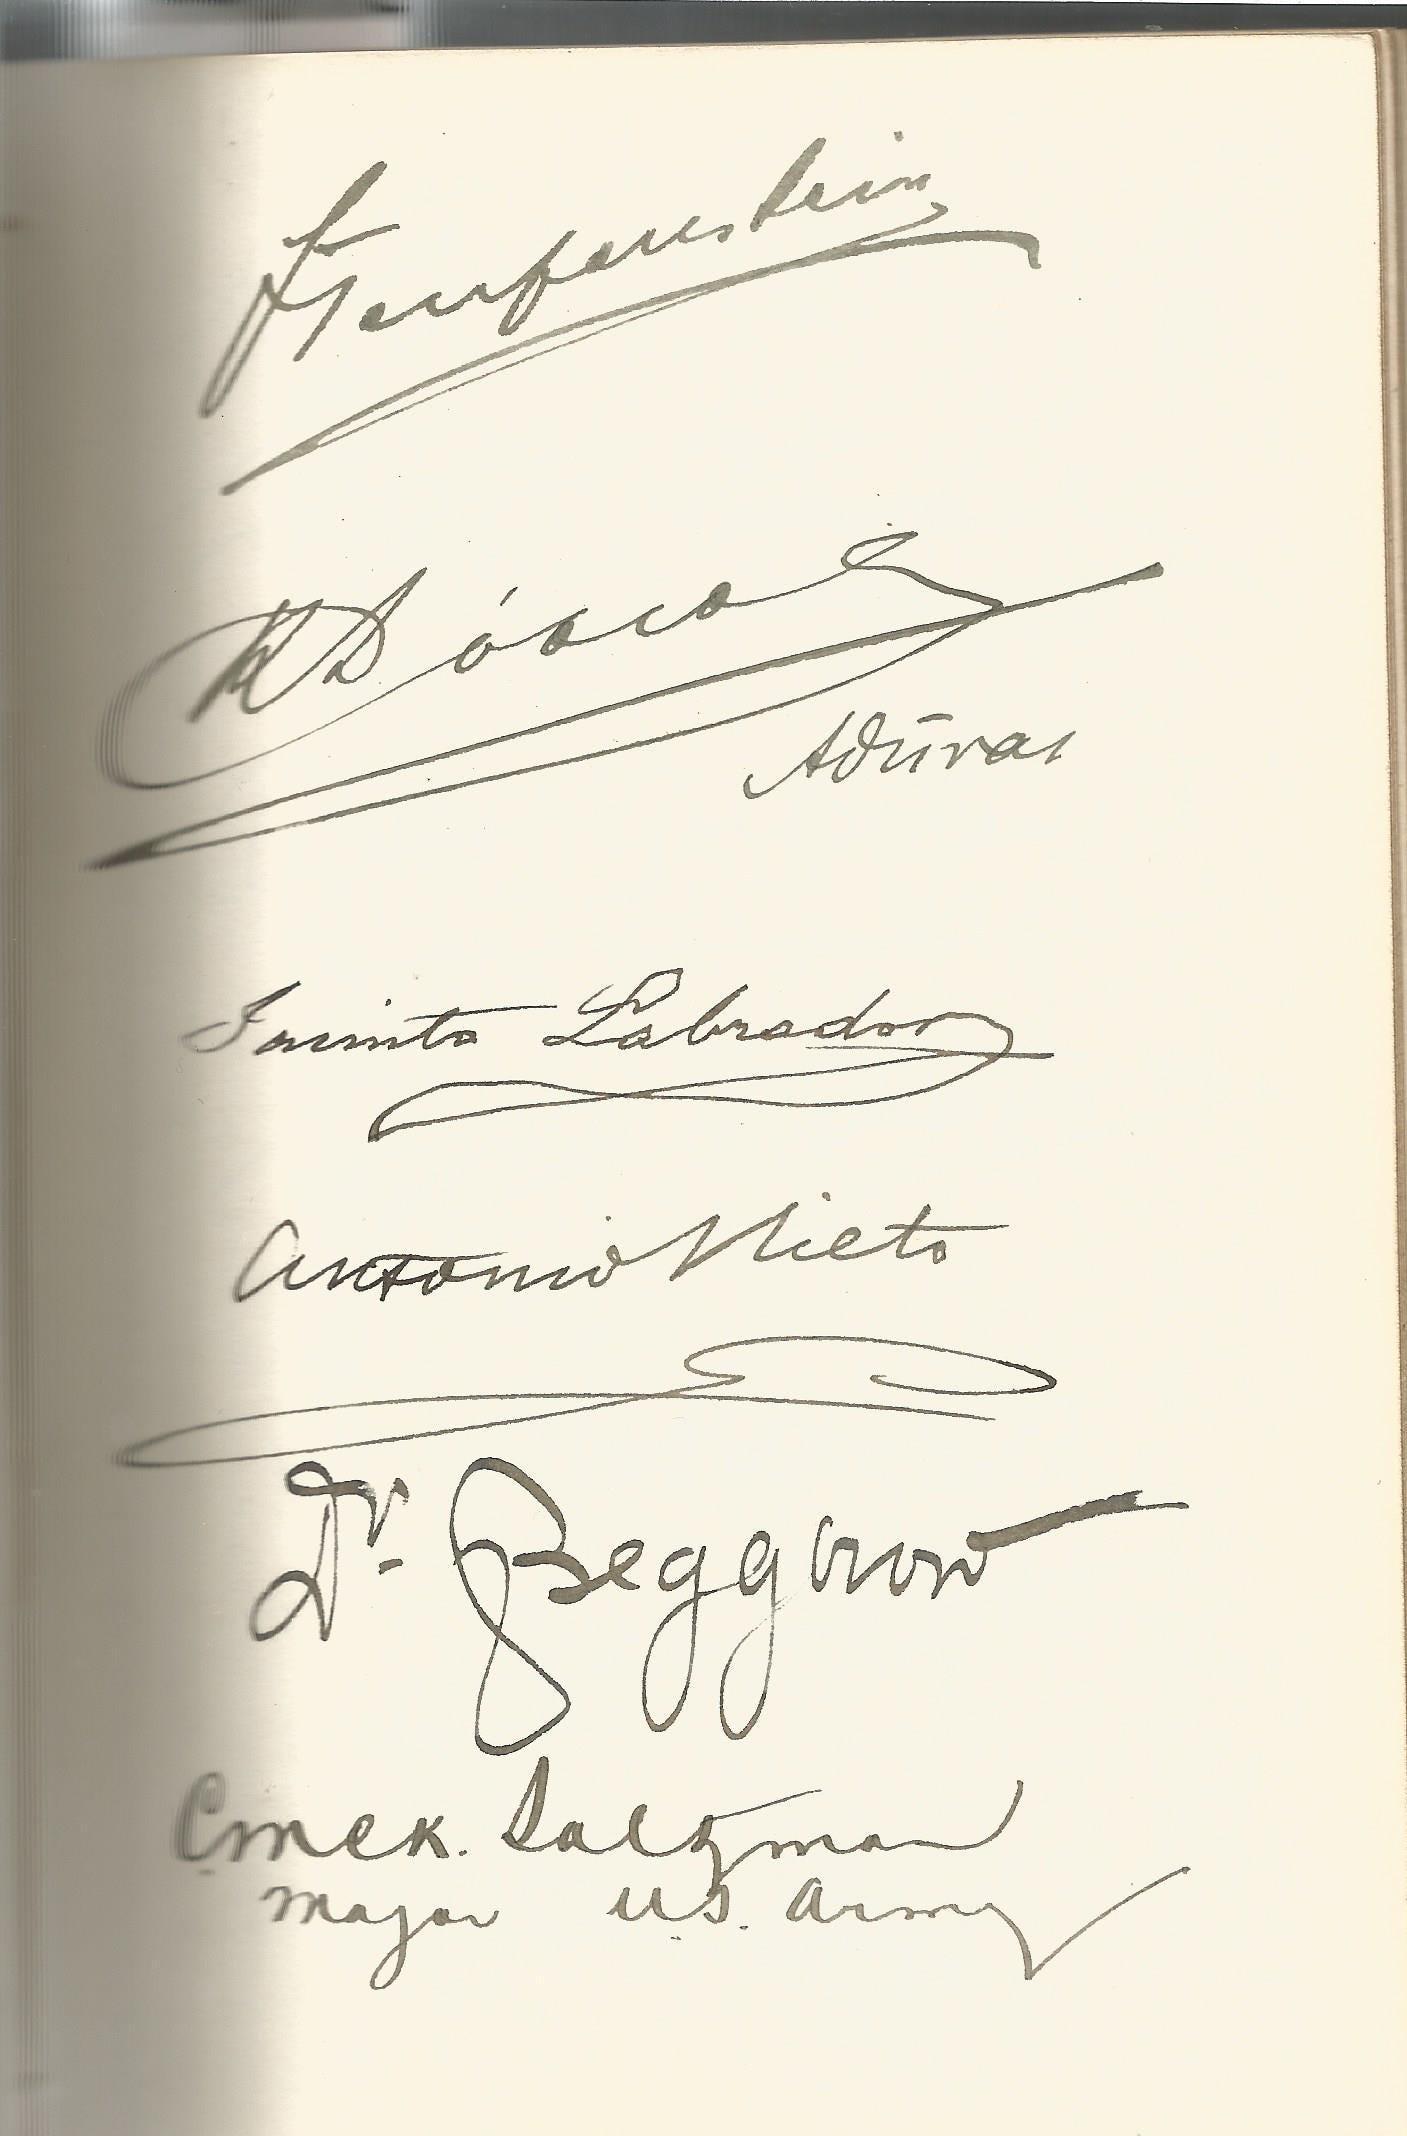 Guglielmo Marconi multiple signed International Radio Telegraph Conference London 1912 vintage - Image 4 of 5